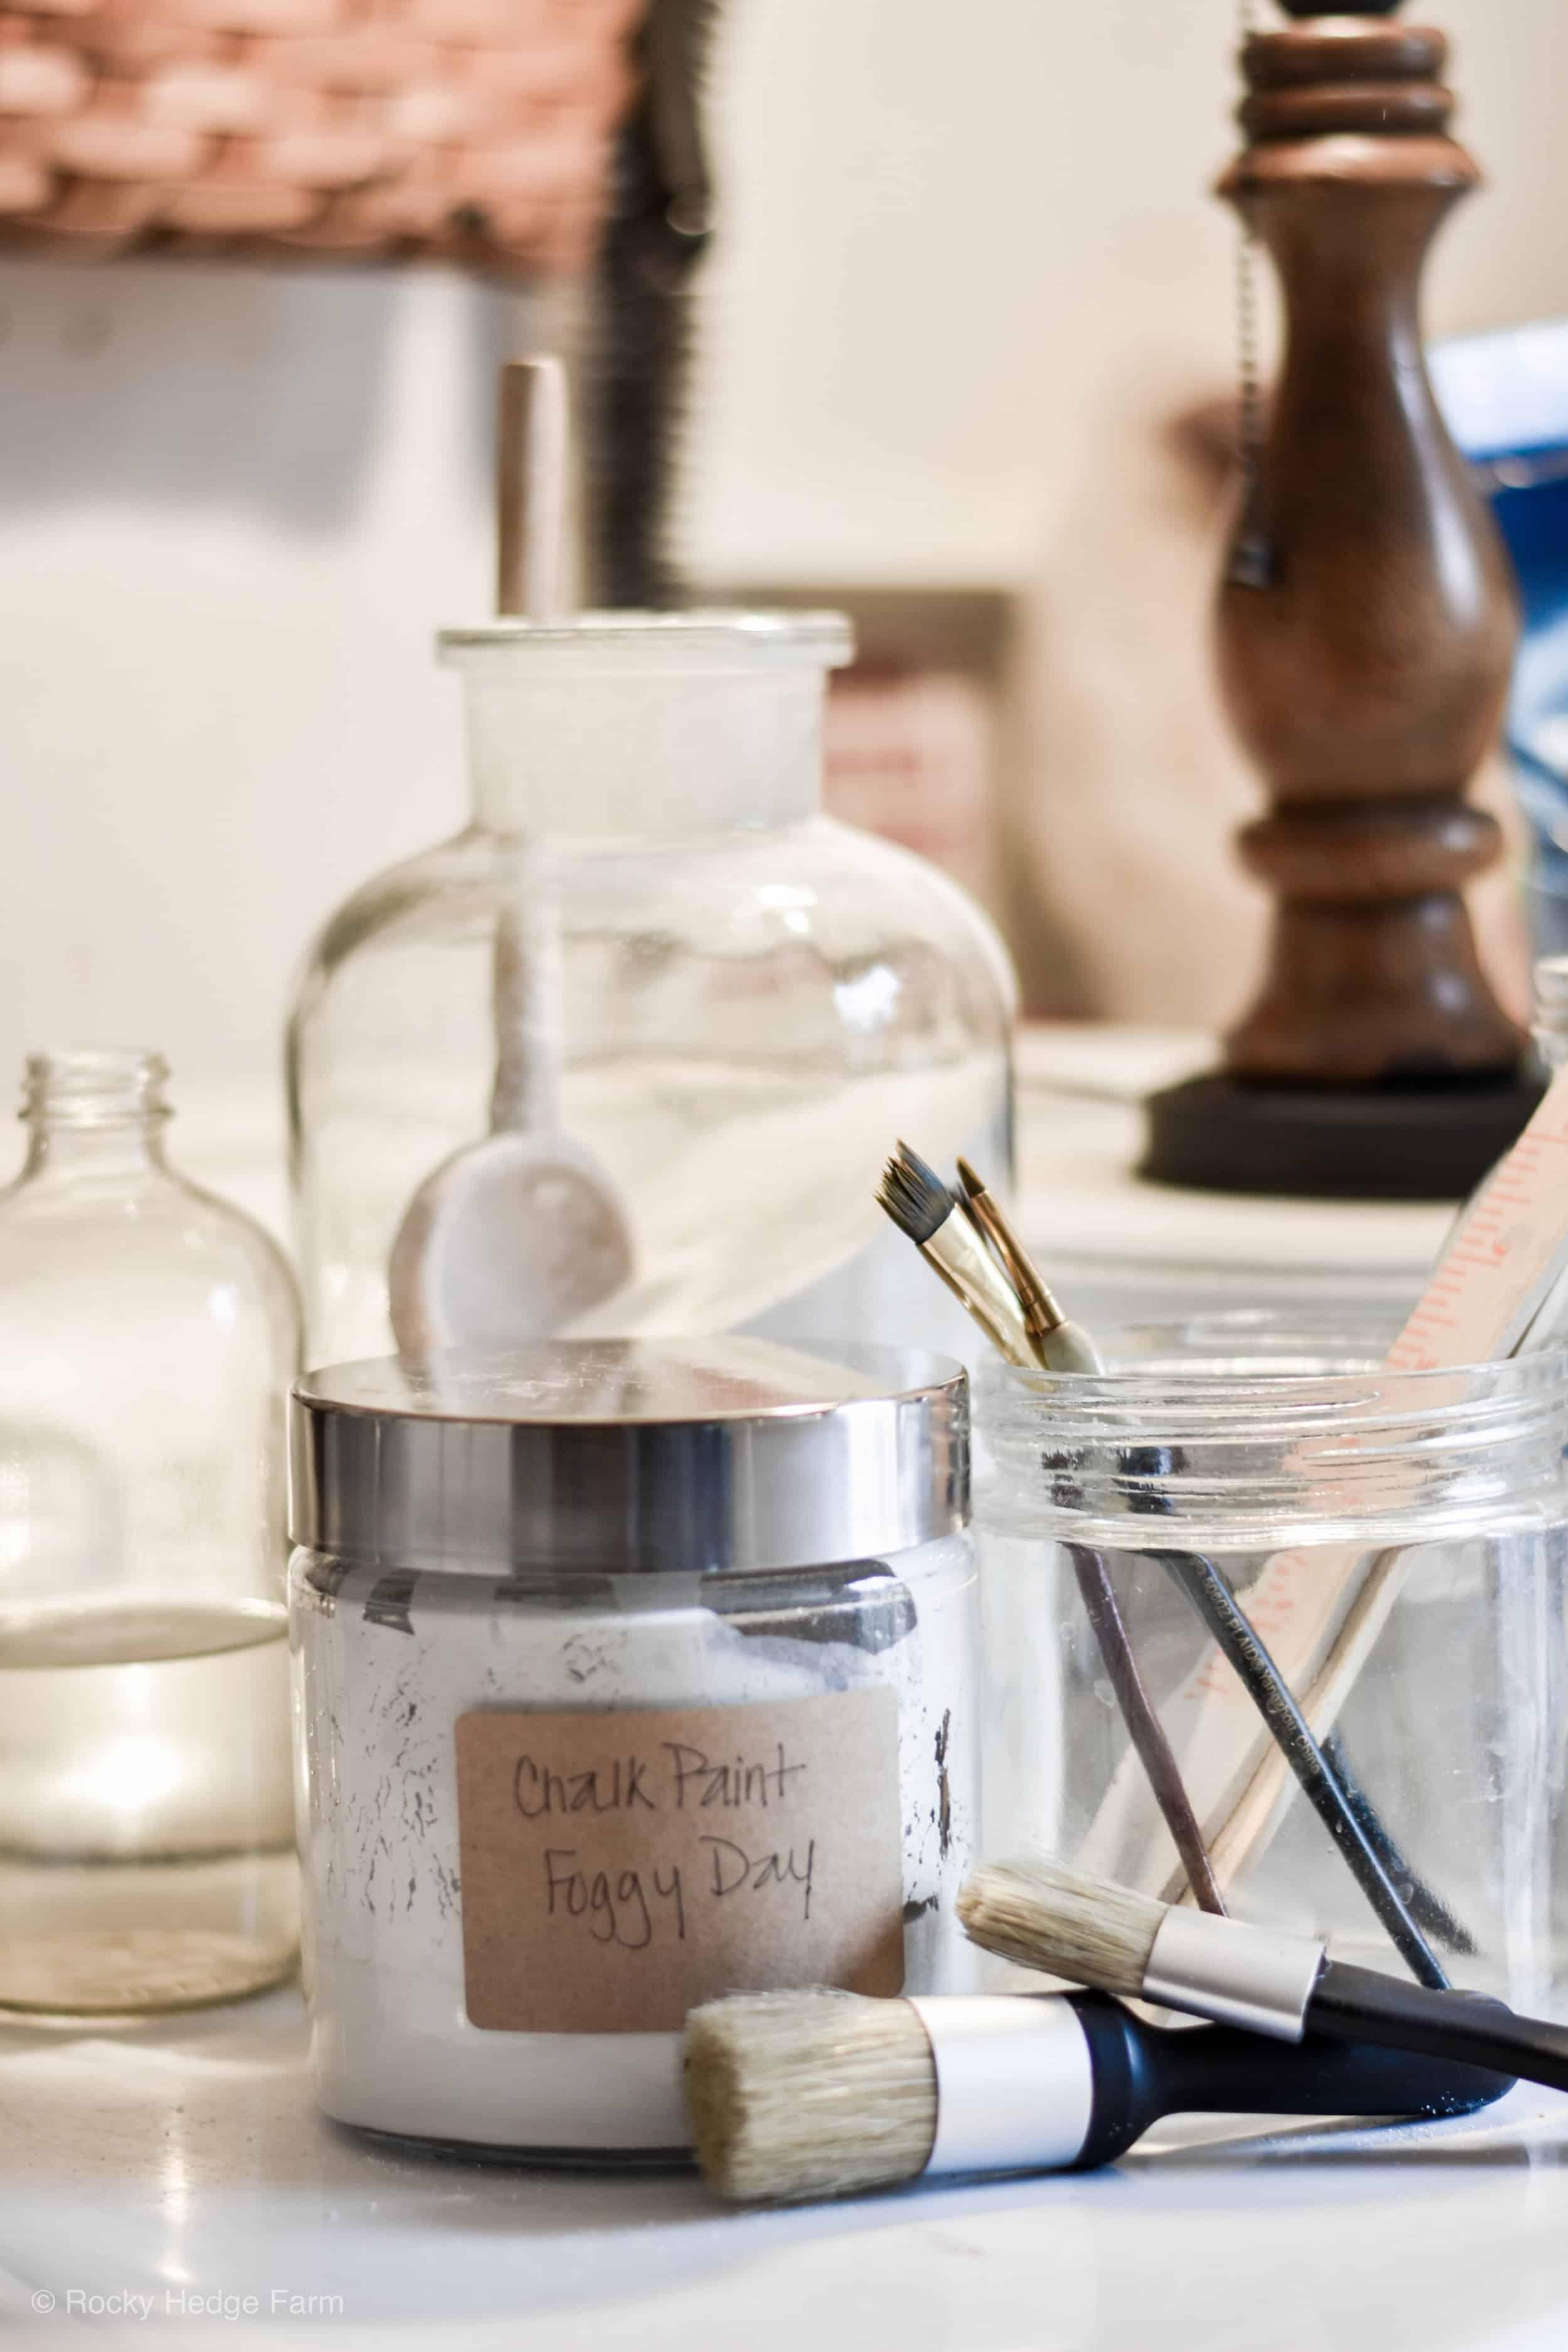 How to Make Chalk Paint - Rocky Hedge Farm